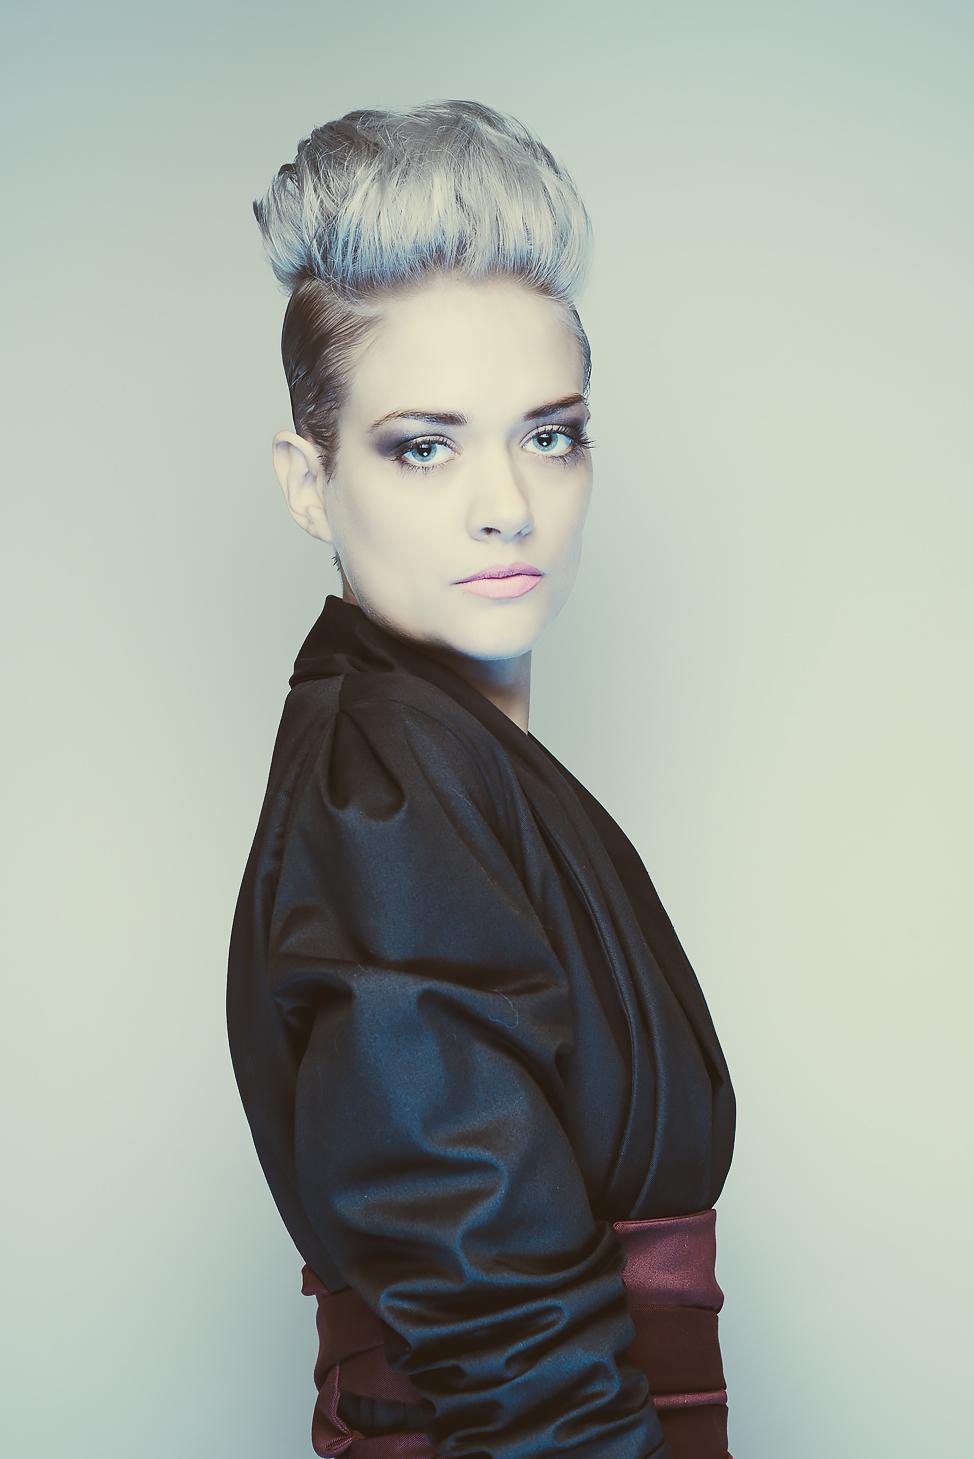 zaramia-ava-zaramiaava-leeds-fashion-designer-ethical-sustainable-tailored-minimalist-mio-black-jacket-top-red-belt-versatile-drape-cowl-styling-menswear-models-photoshoot-shrine-hairdressers-38